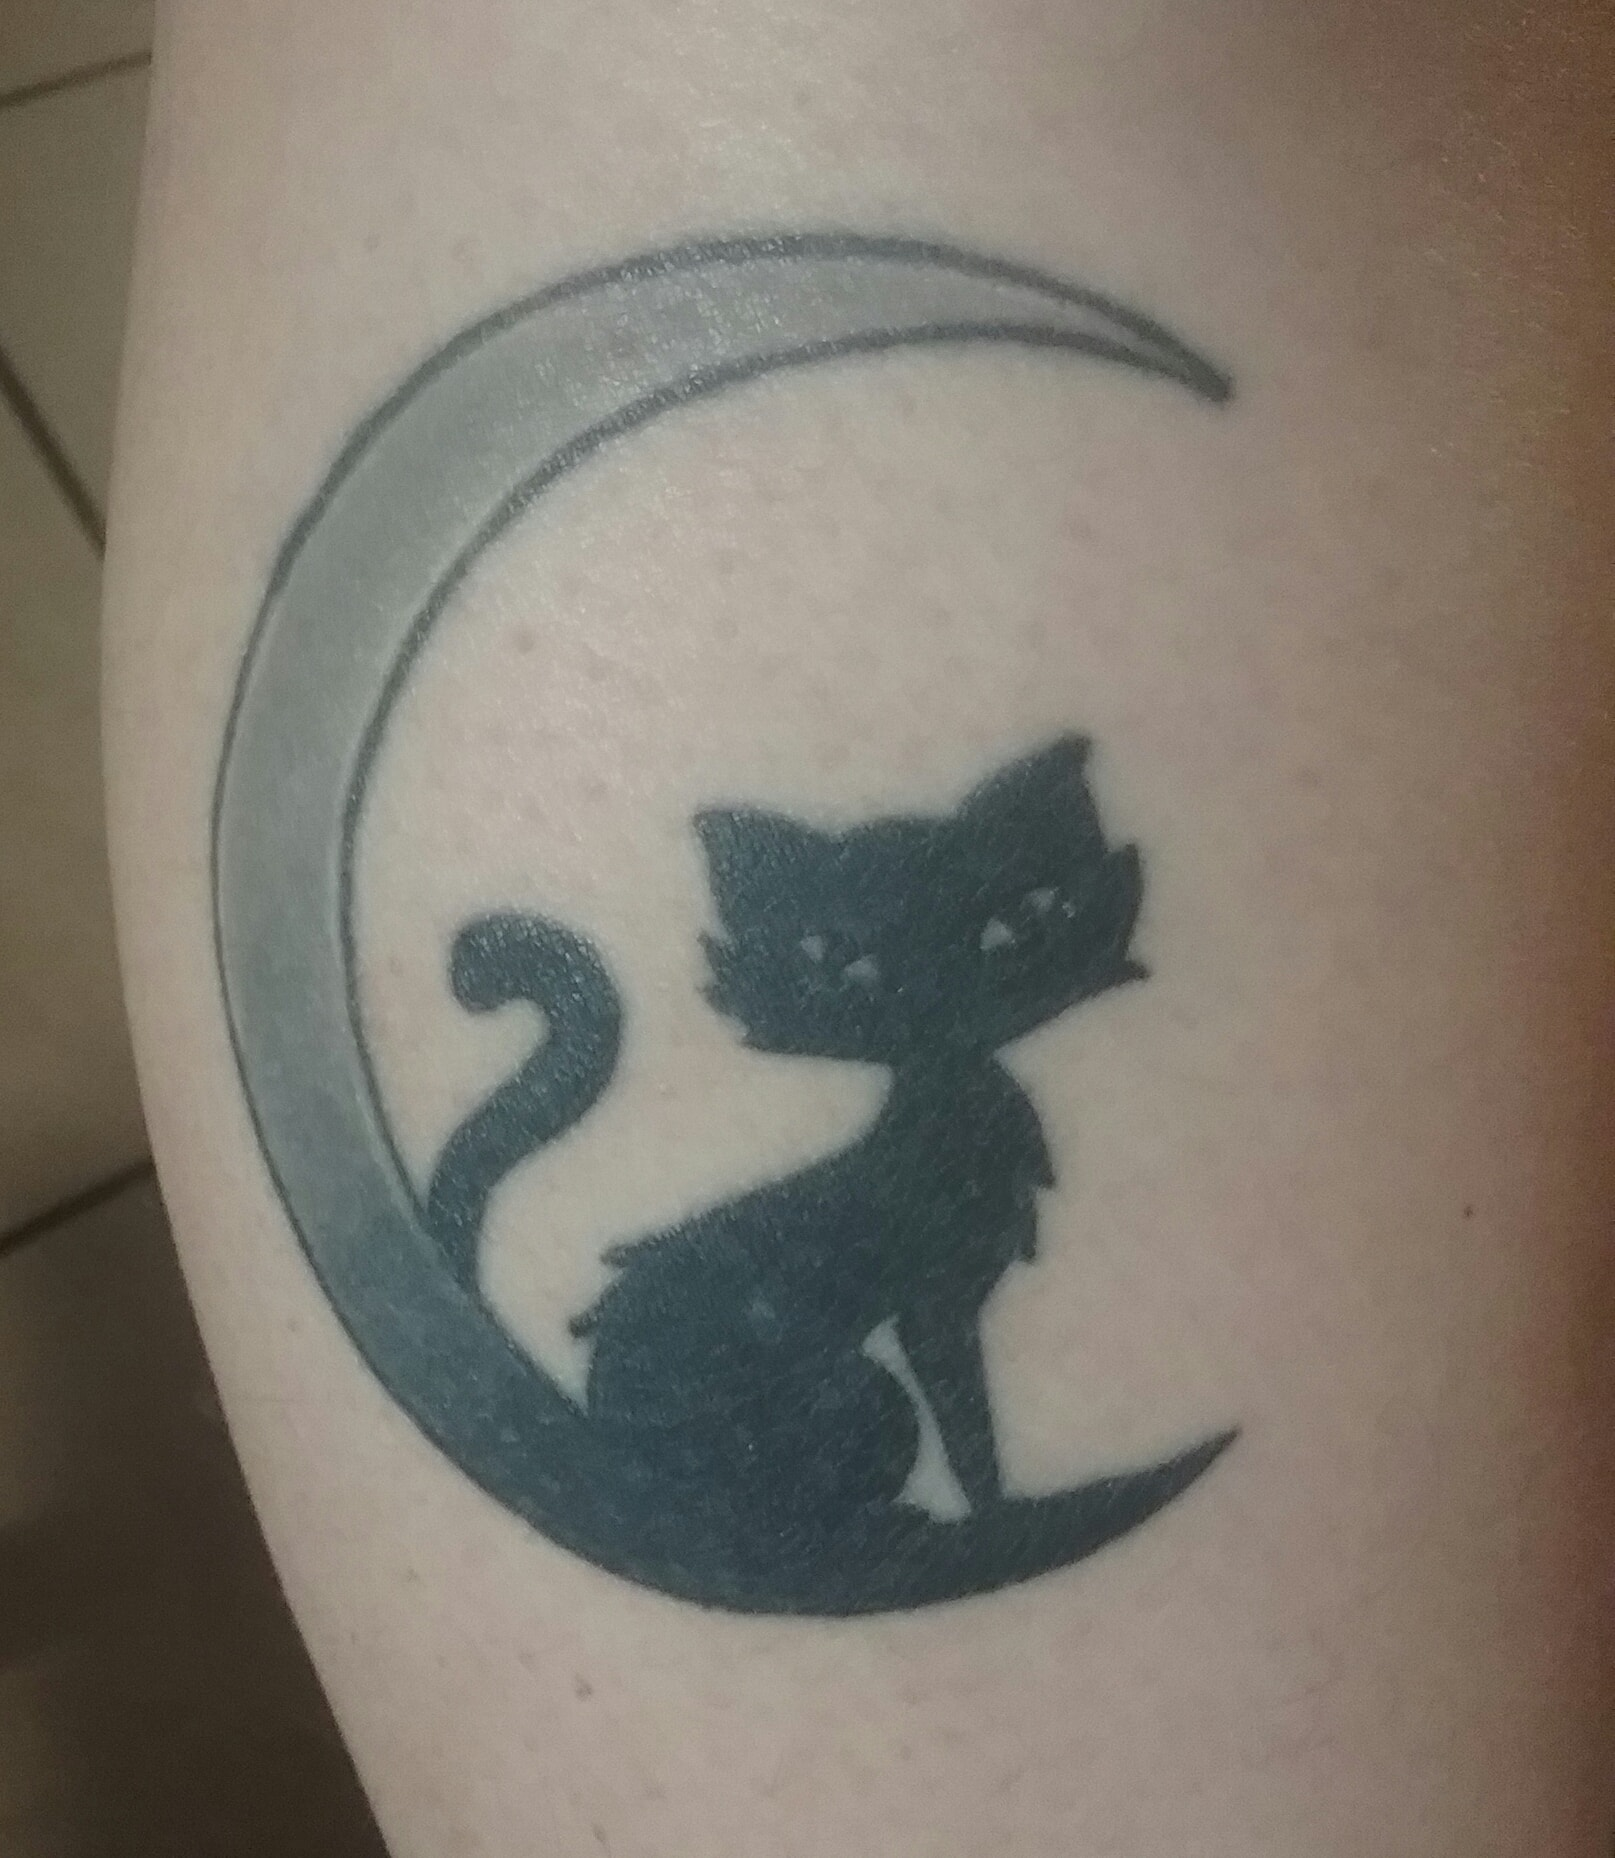 Pokémon-Fanart: Mein Tattoo